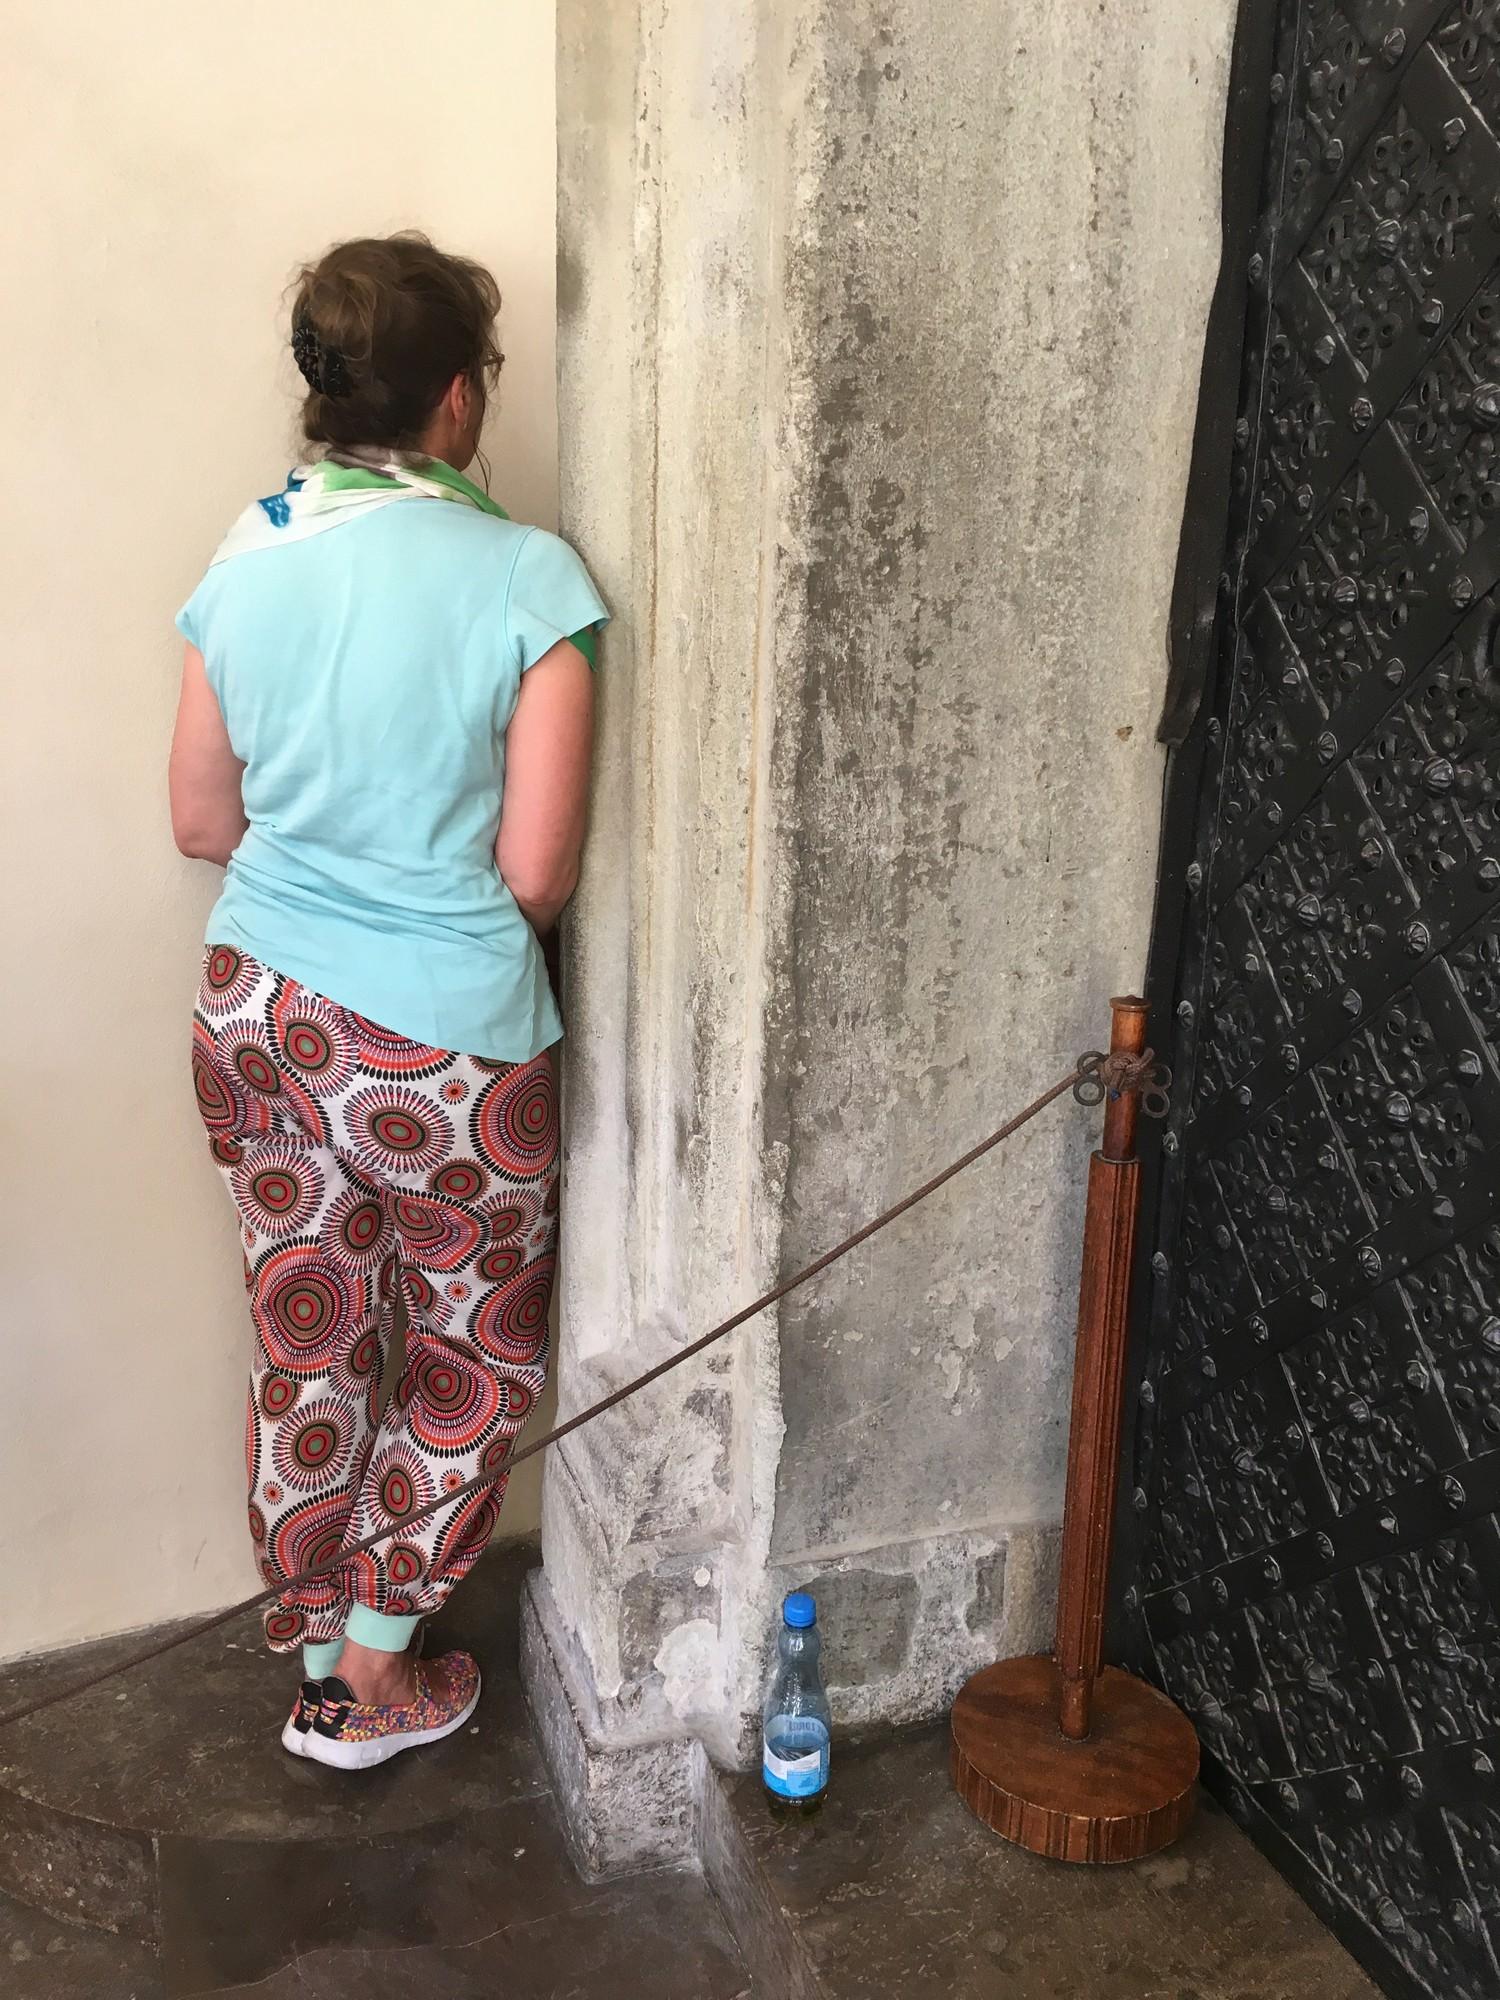 The Legend of the Wawel Chakra Stone: What is the Wawel Chakra